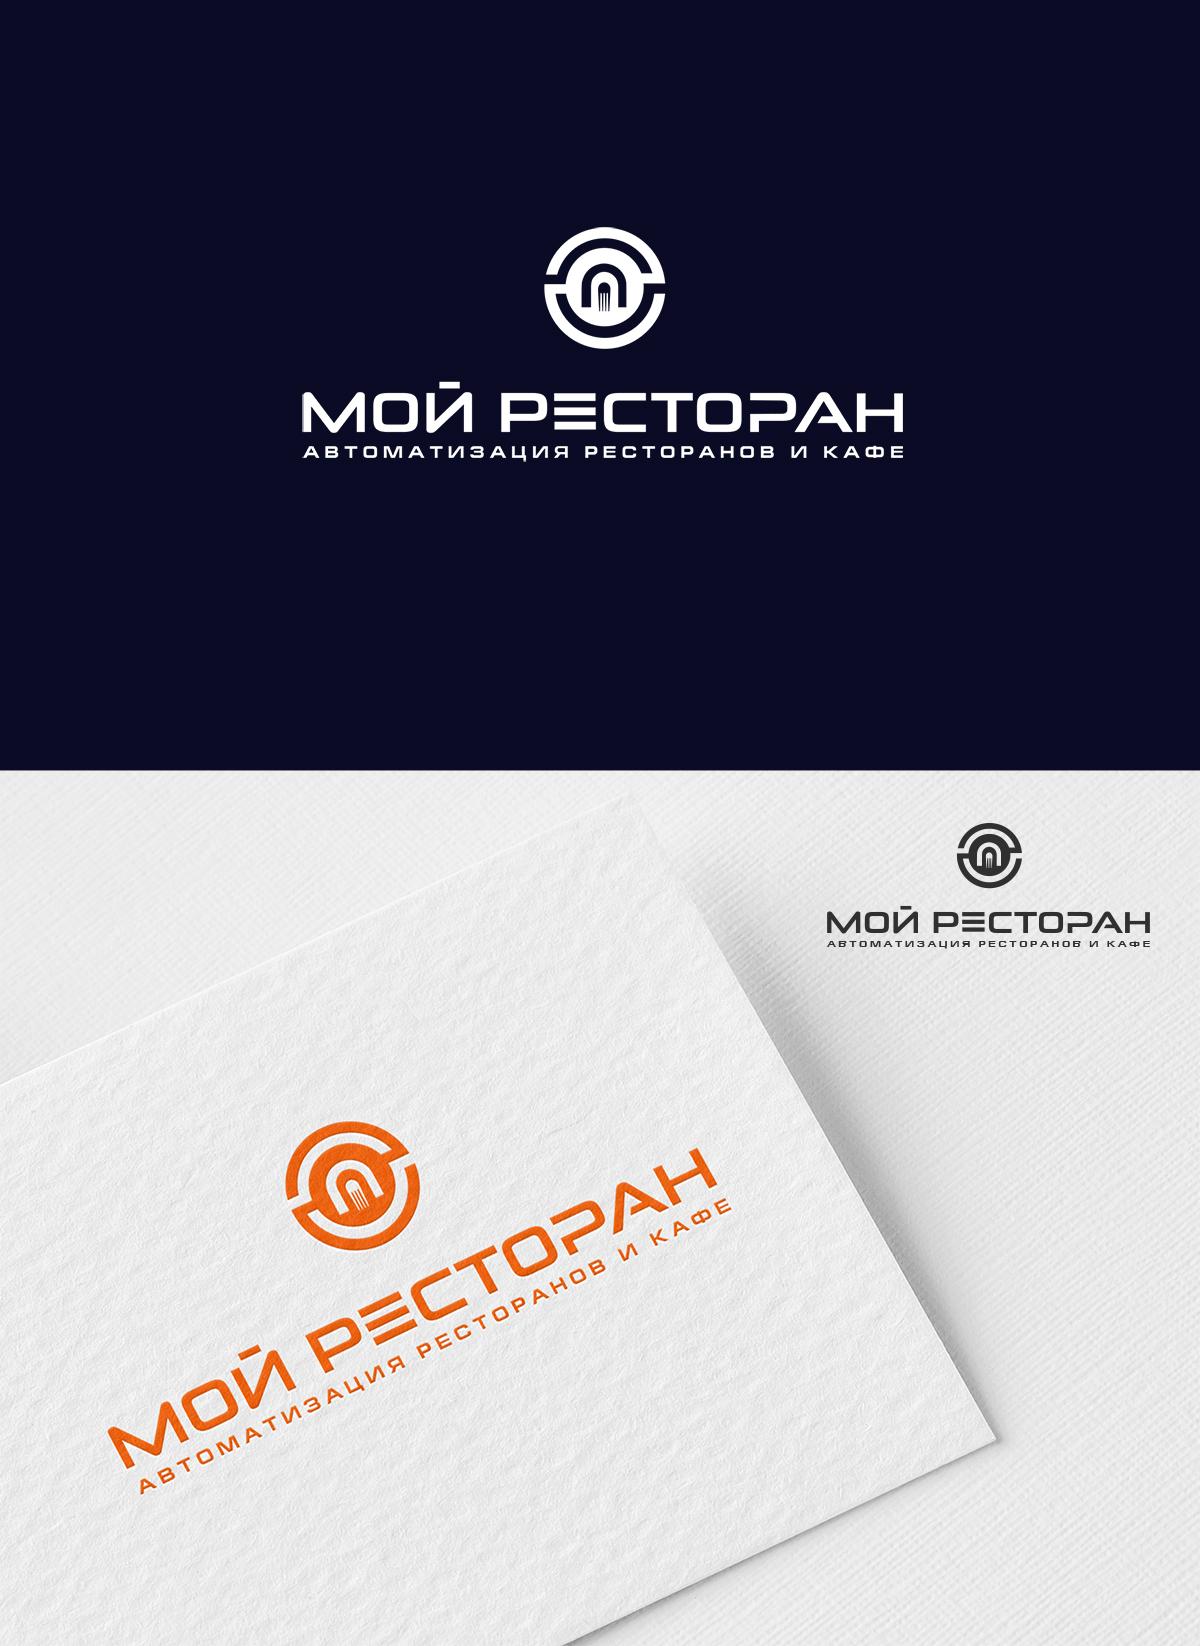 Разработать логотип и фавикон для IT- компании фото f_4875d532e3383b40.jpg